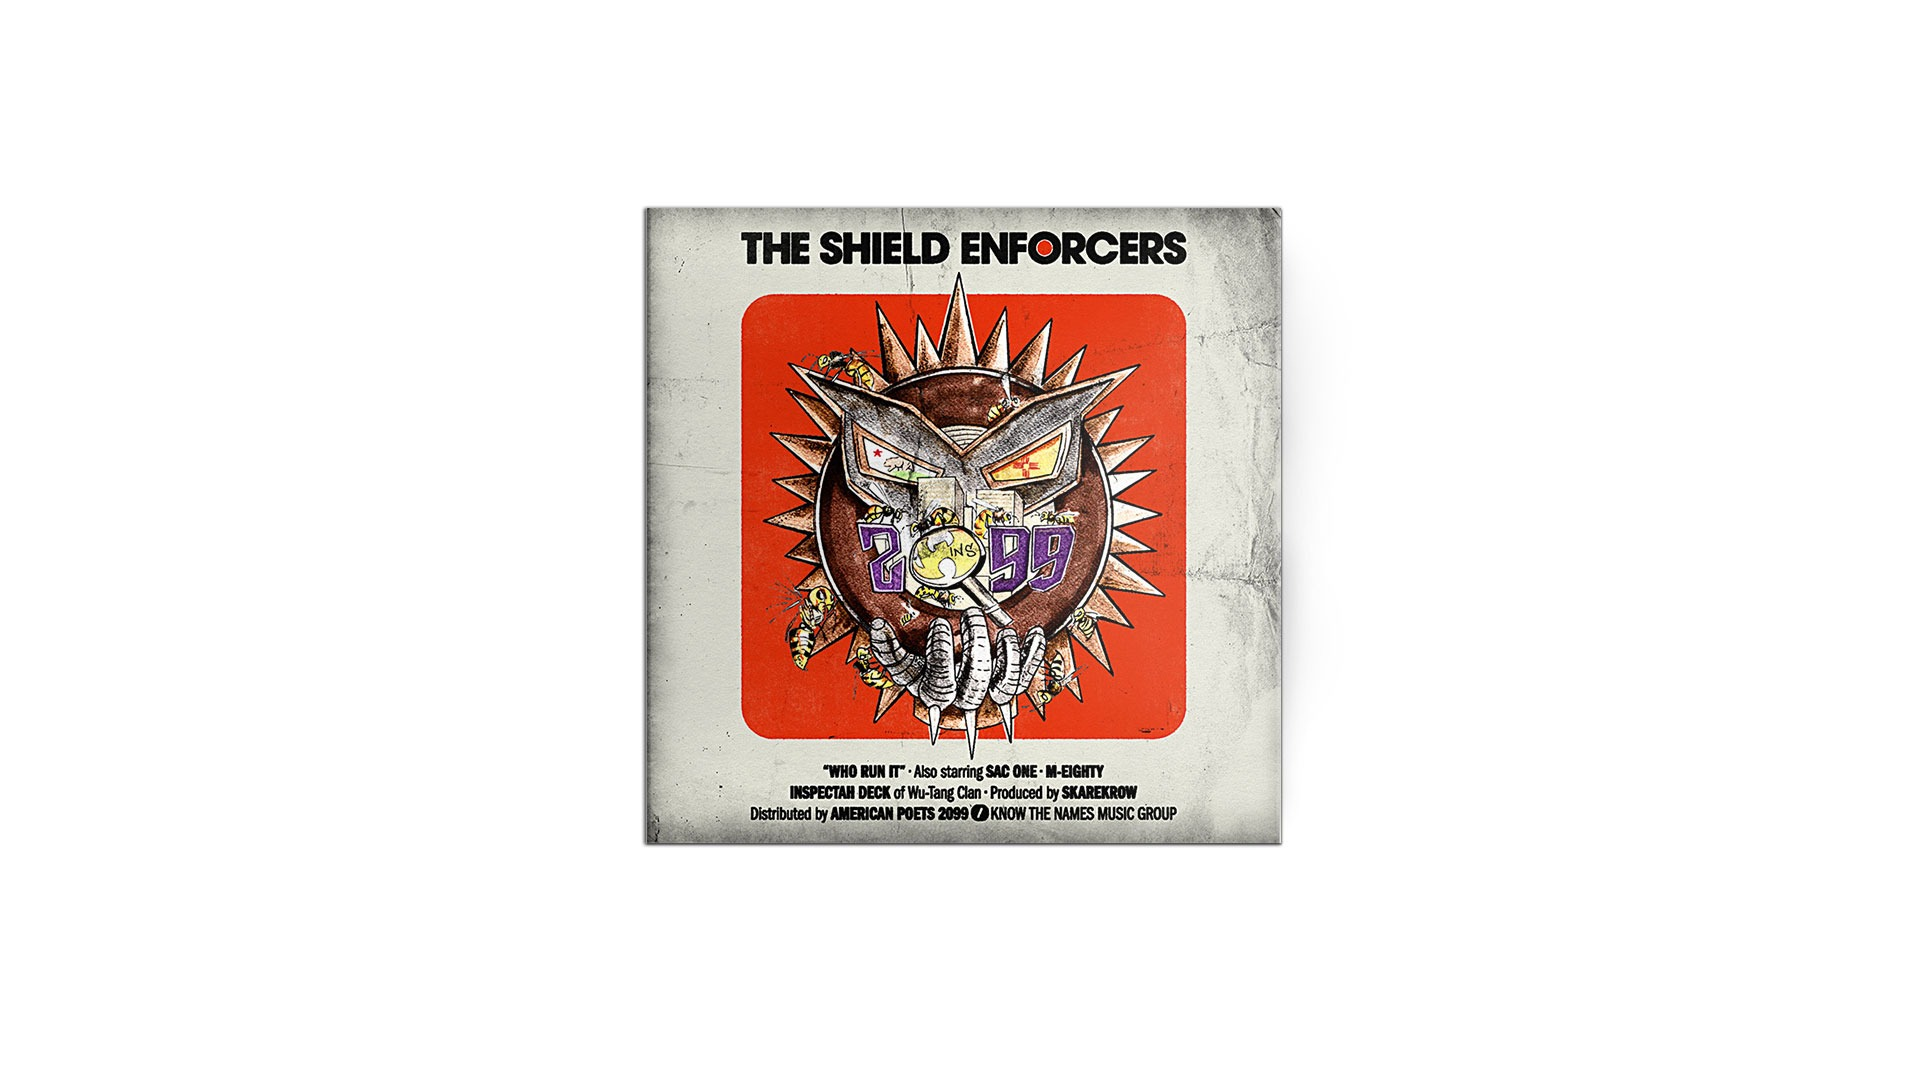 shield-deck-who-run-it